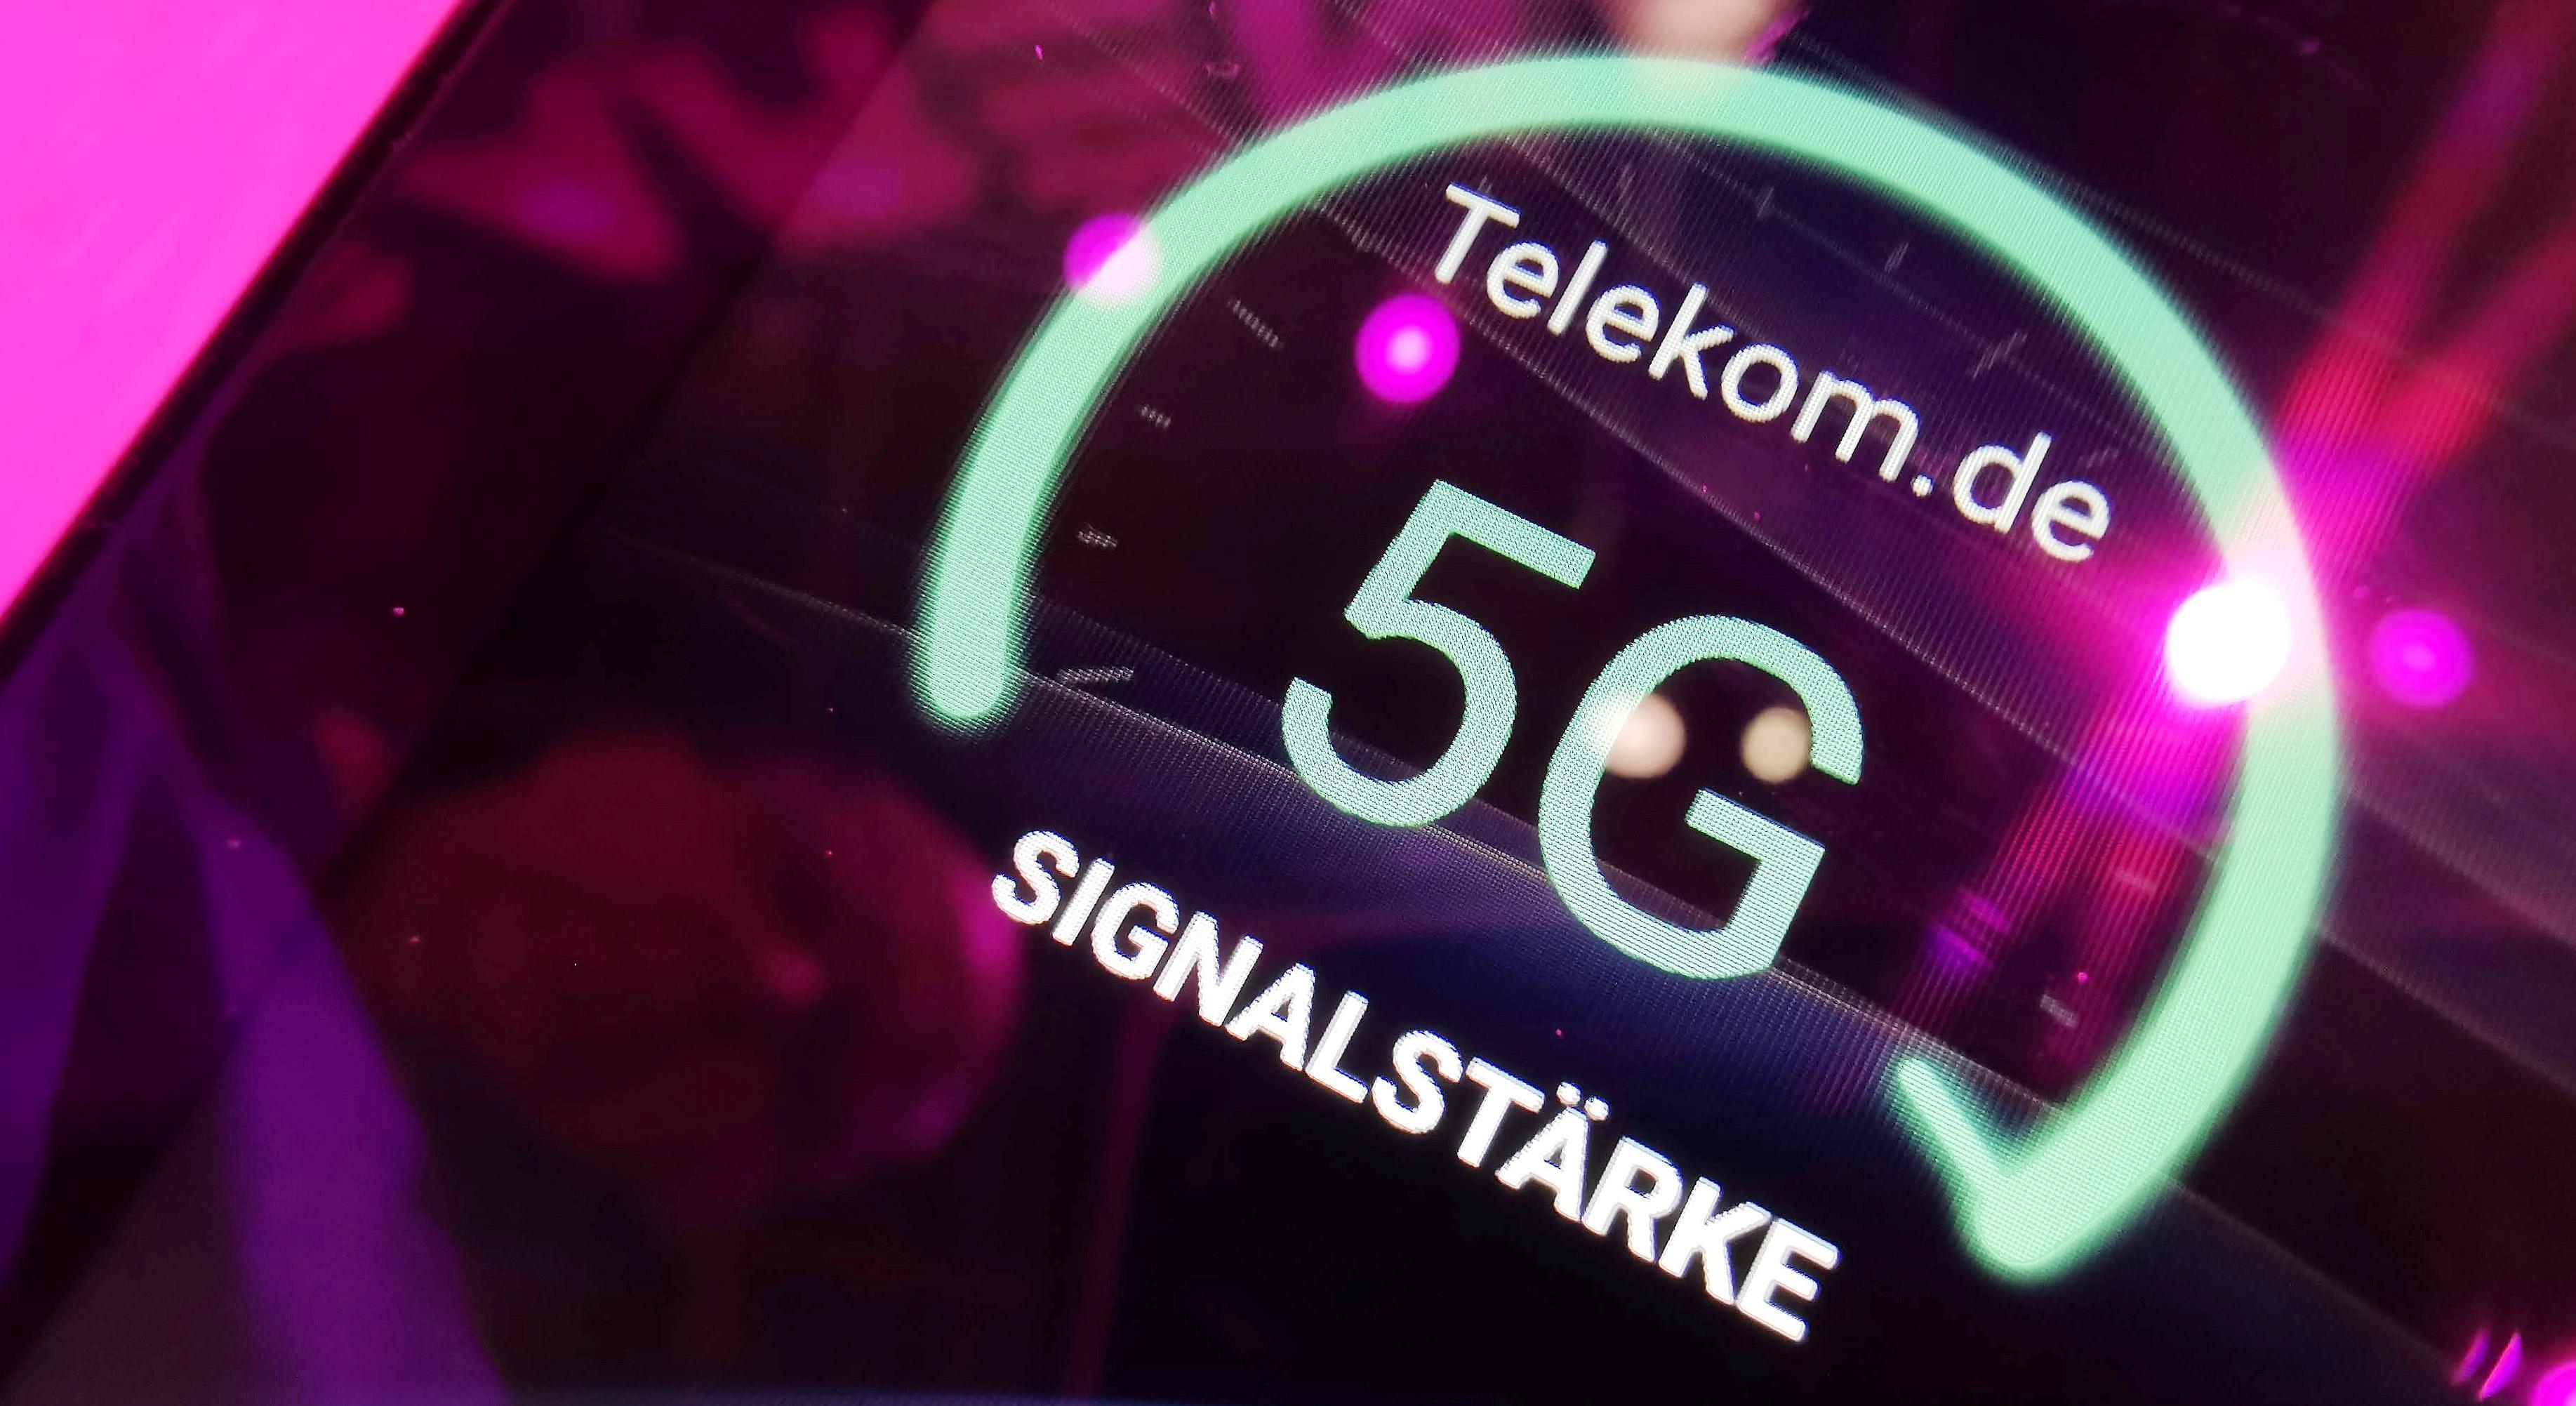 Exclusive: Fearing Huawei curbs, Deutsche Telekom tells Nokia to shape up